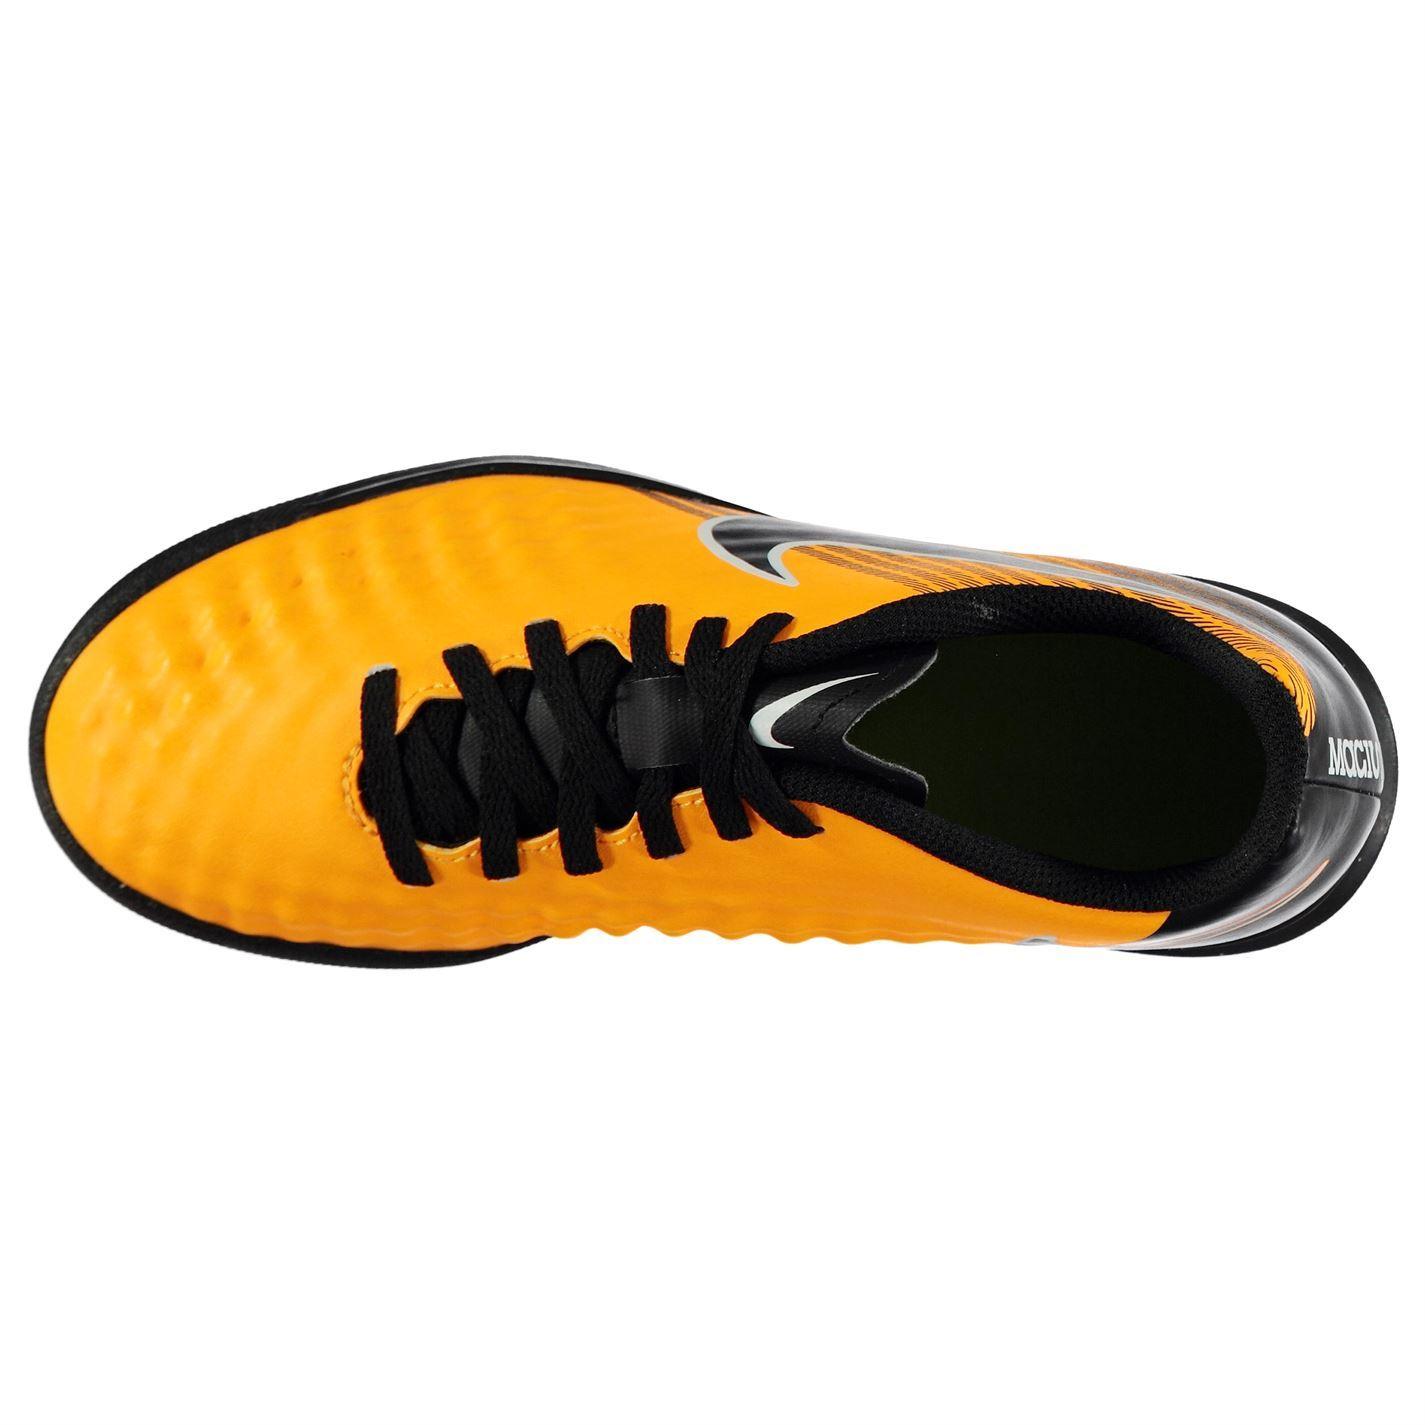 68bb19bb6c98 ... Nike Magista Ola II Astro Turf Football Trainers Juniors Orange Soccer  Shoes